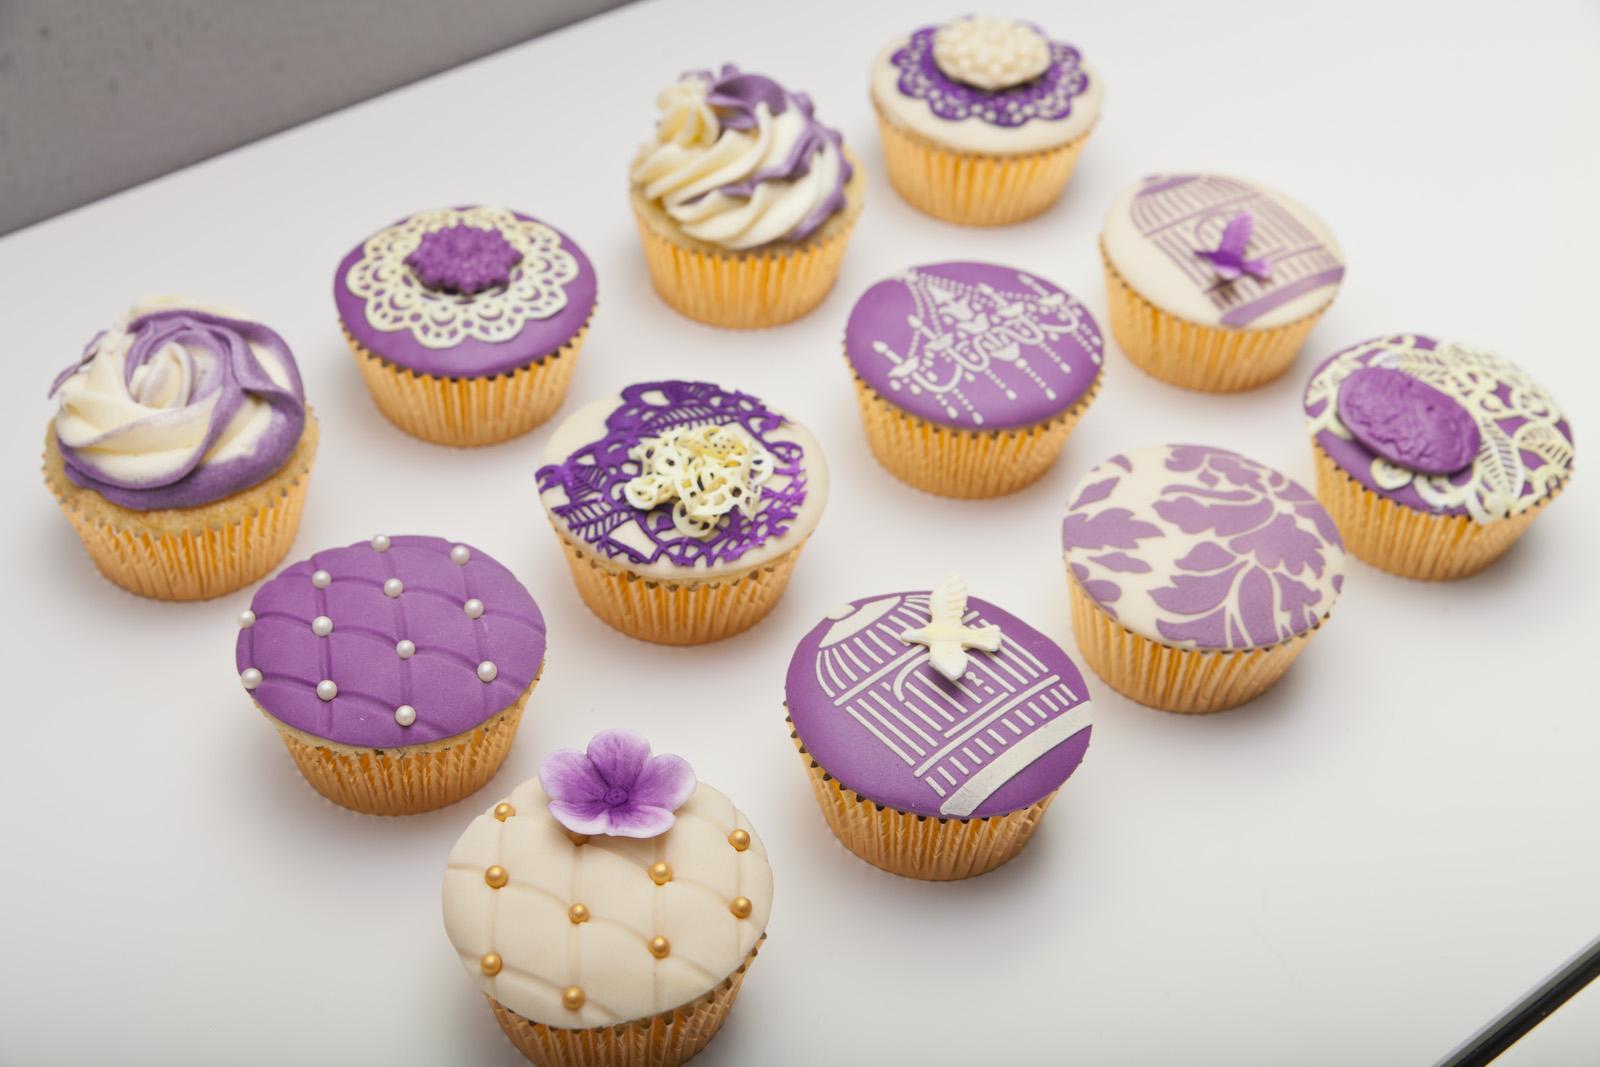 Neue Kurstermine Vintage Cupcakes Kurs Und Fondant Basic Kurs